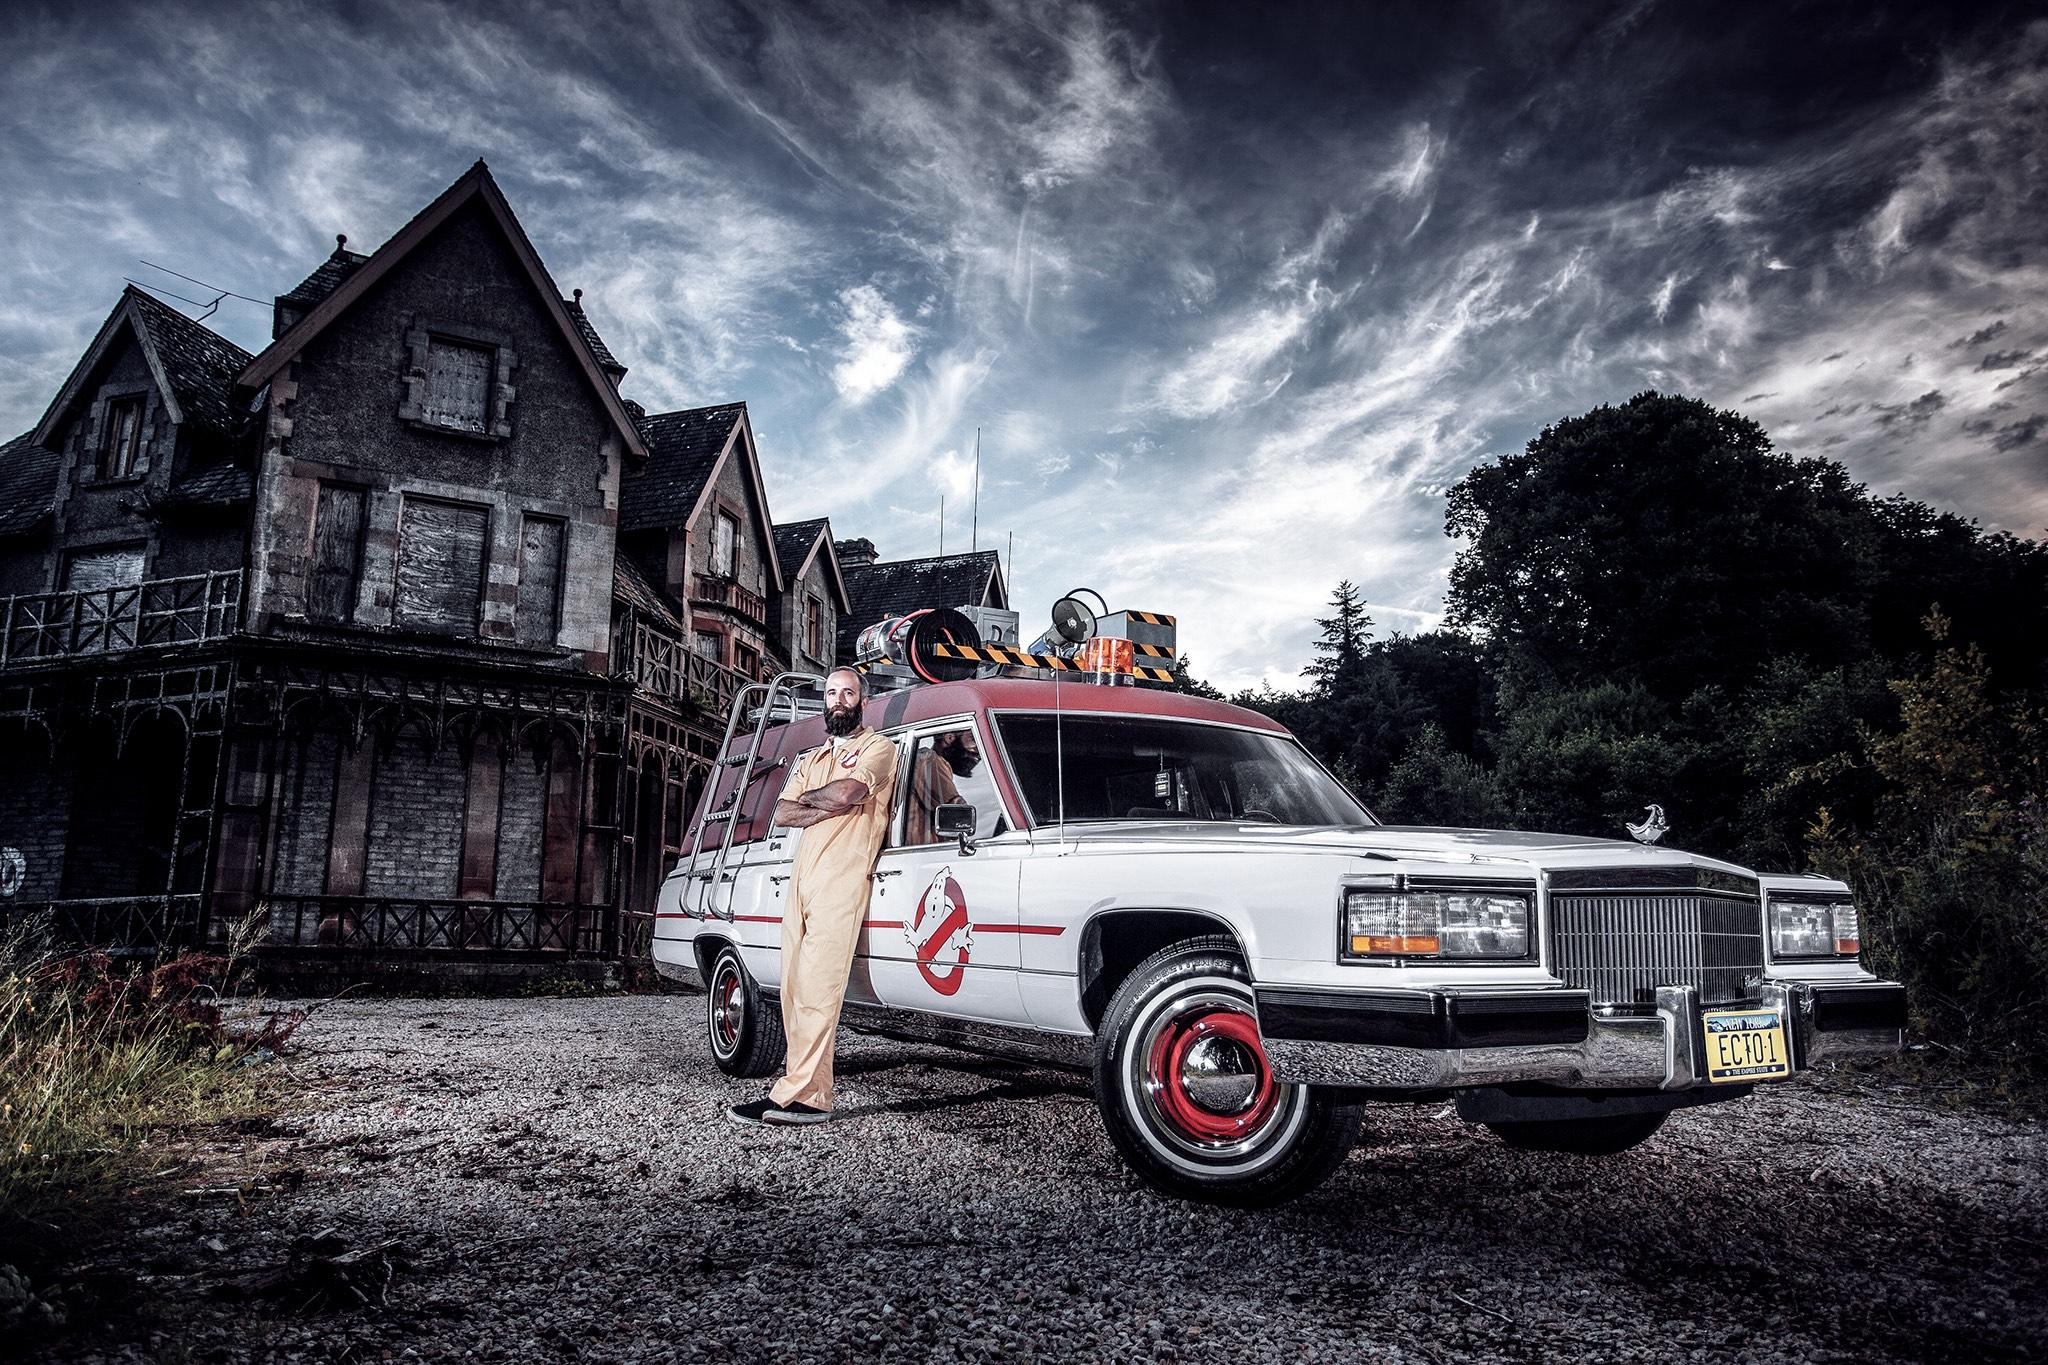 Conor Mcgregor Quote Wallpaper American Hearse Converted Into Ghostbusters Ecto 1